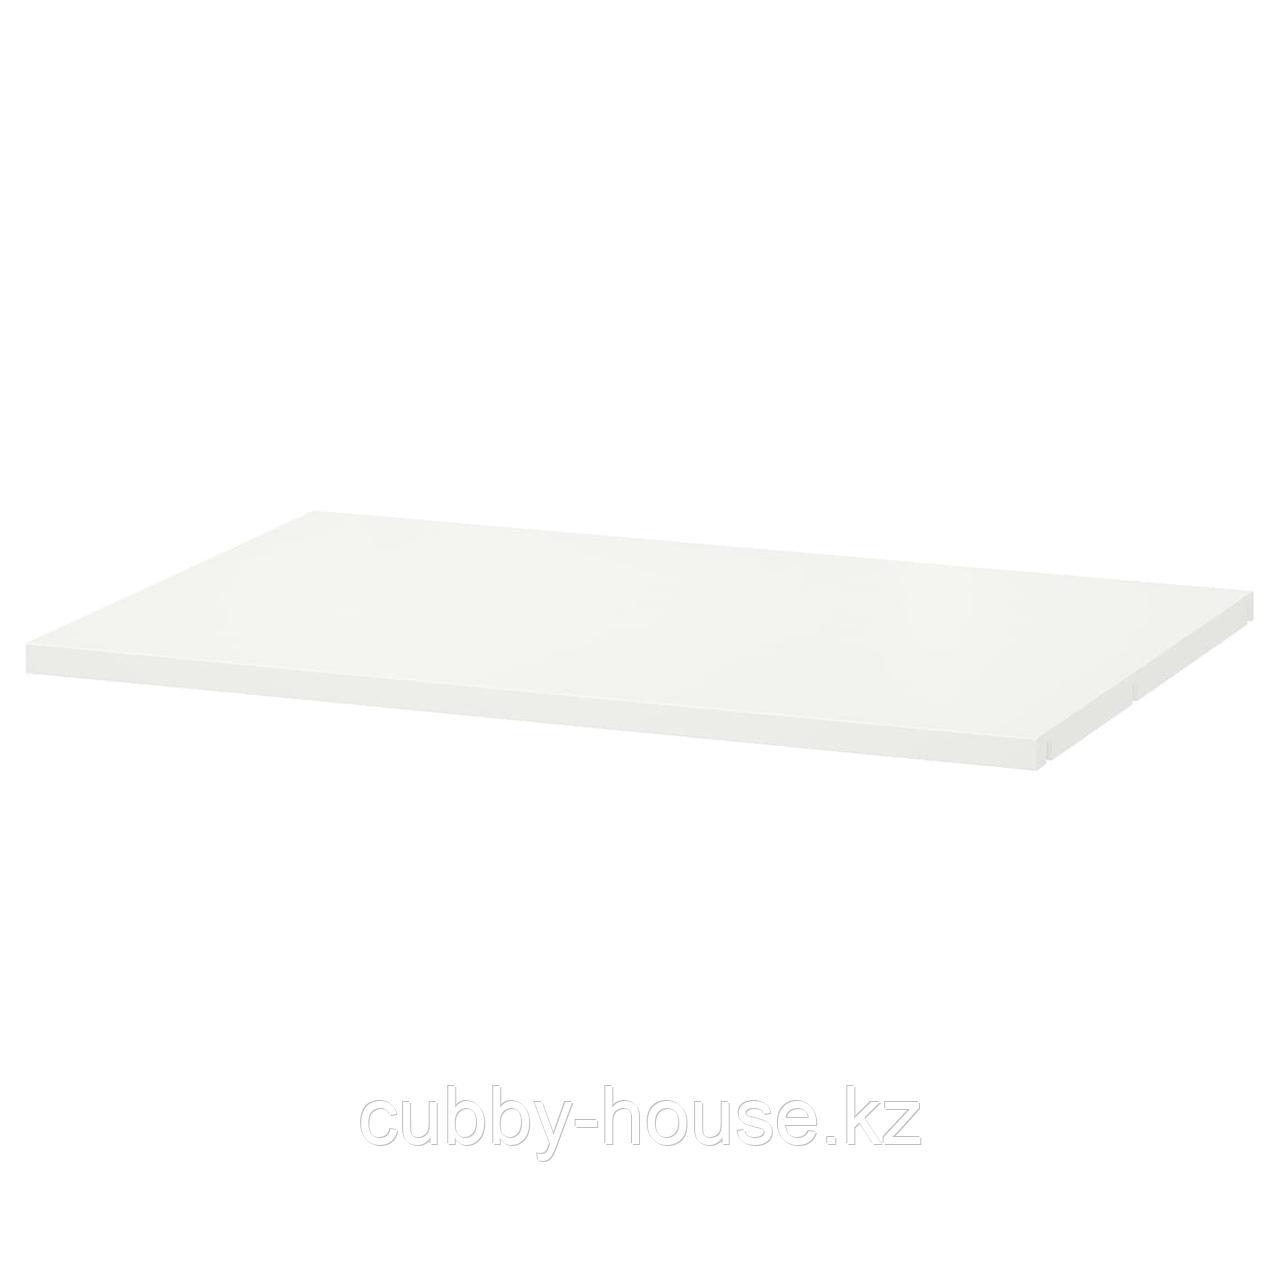 ХЭЛПА Полка, белый, 80x40 см